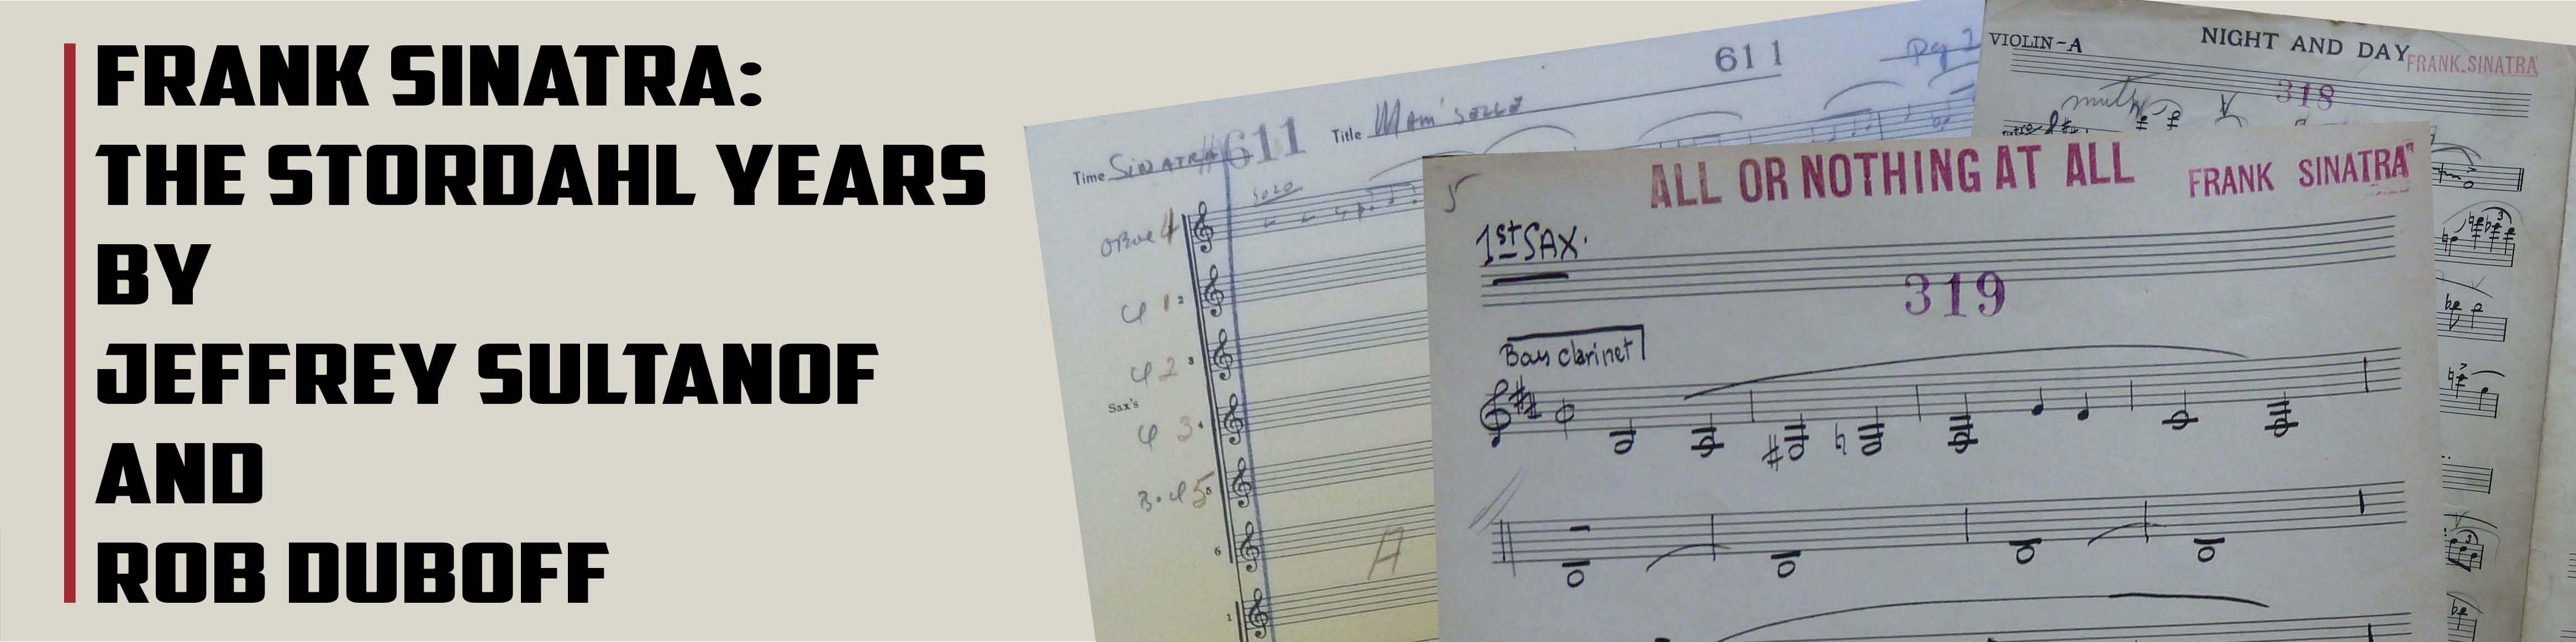 ejazzlines com : Jazz DVDs, Books, Big Band Arrangements, and CDs